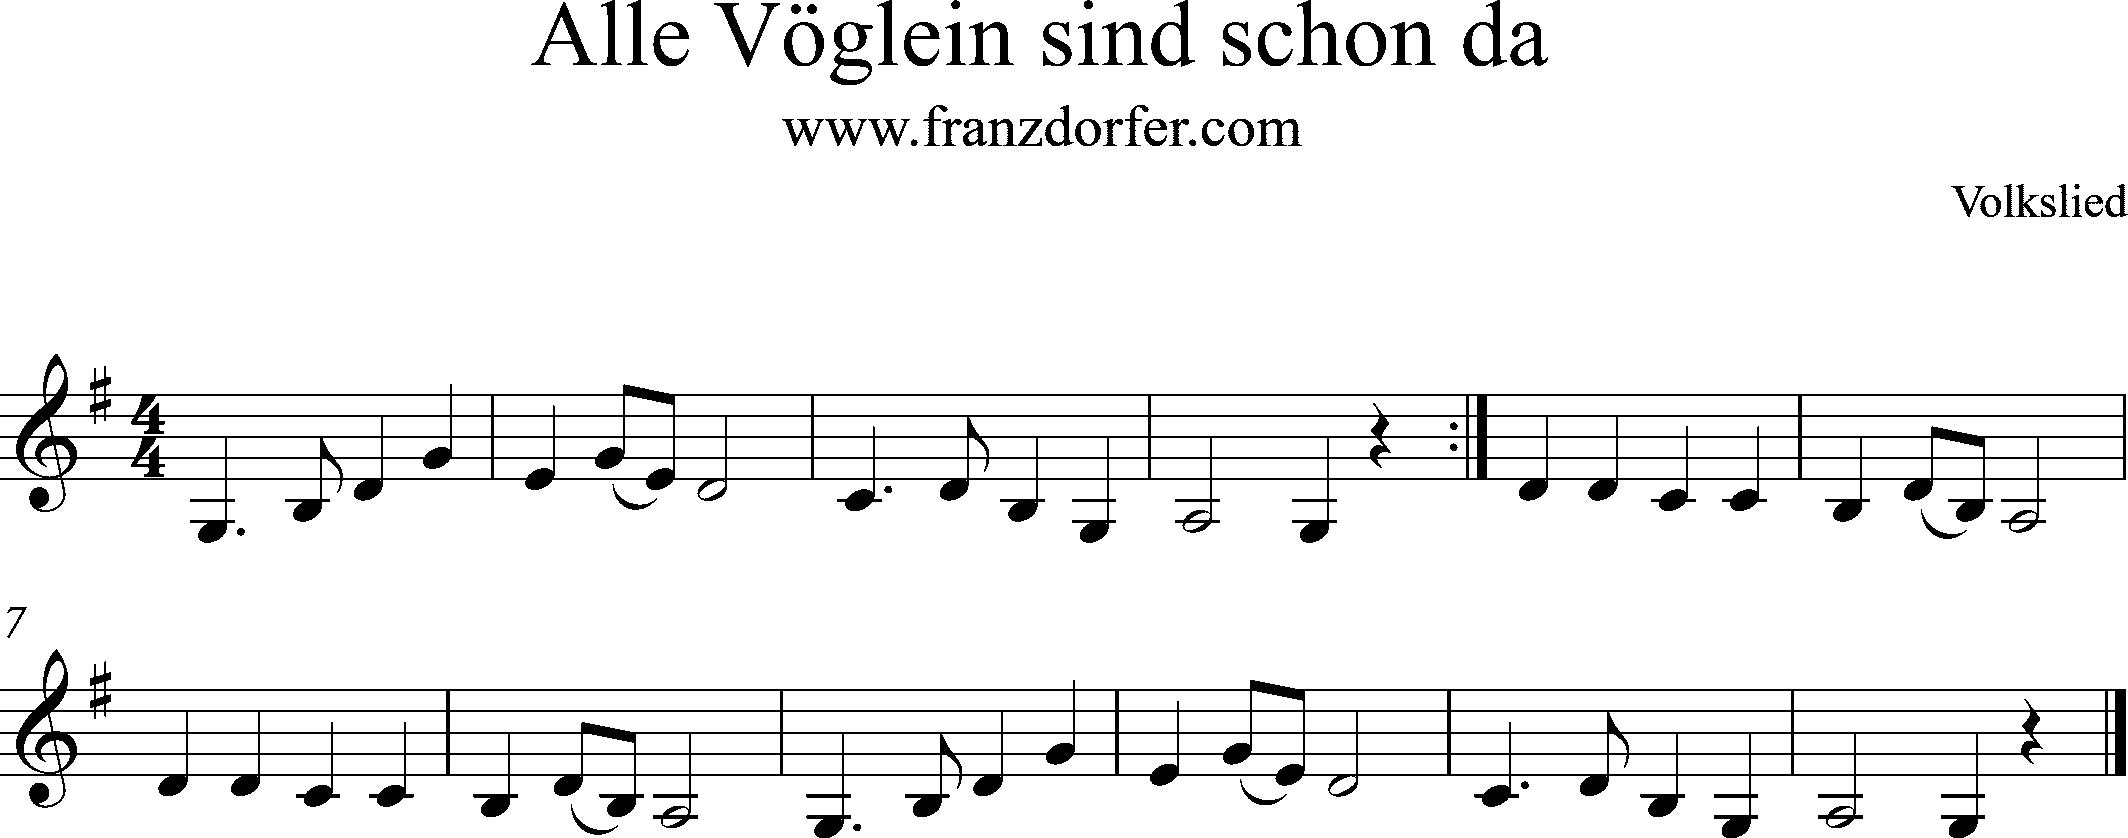 Alle Vöglein- Klarinette Anfänger